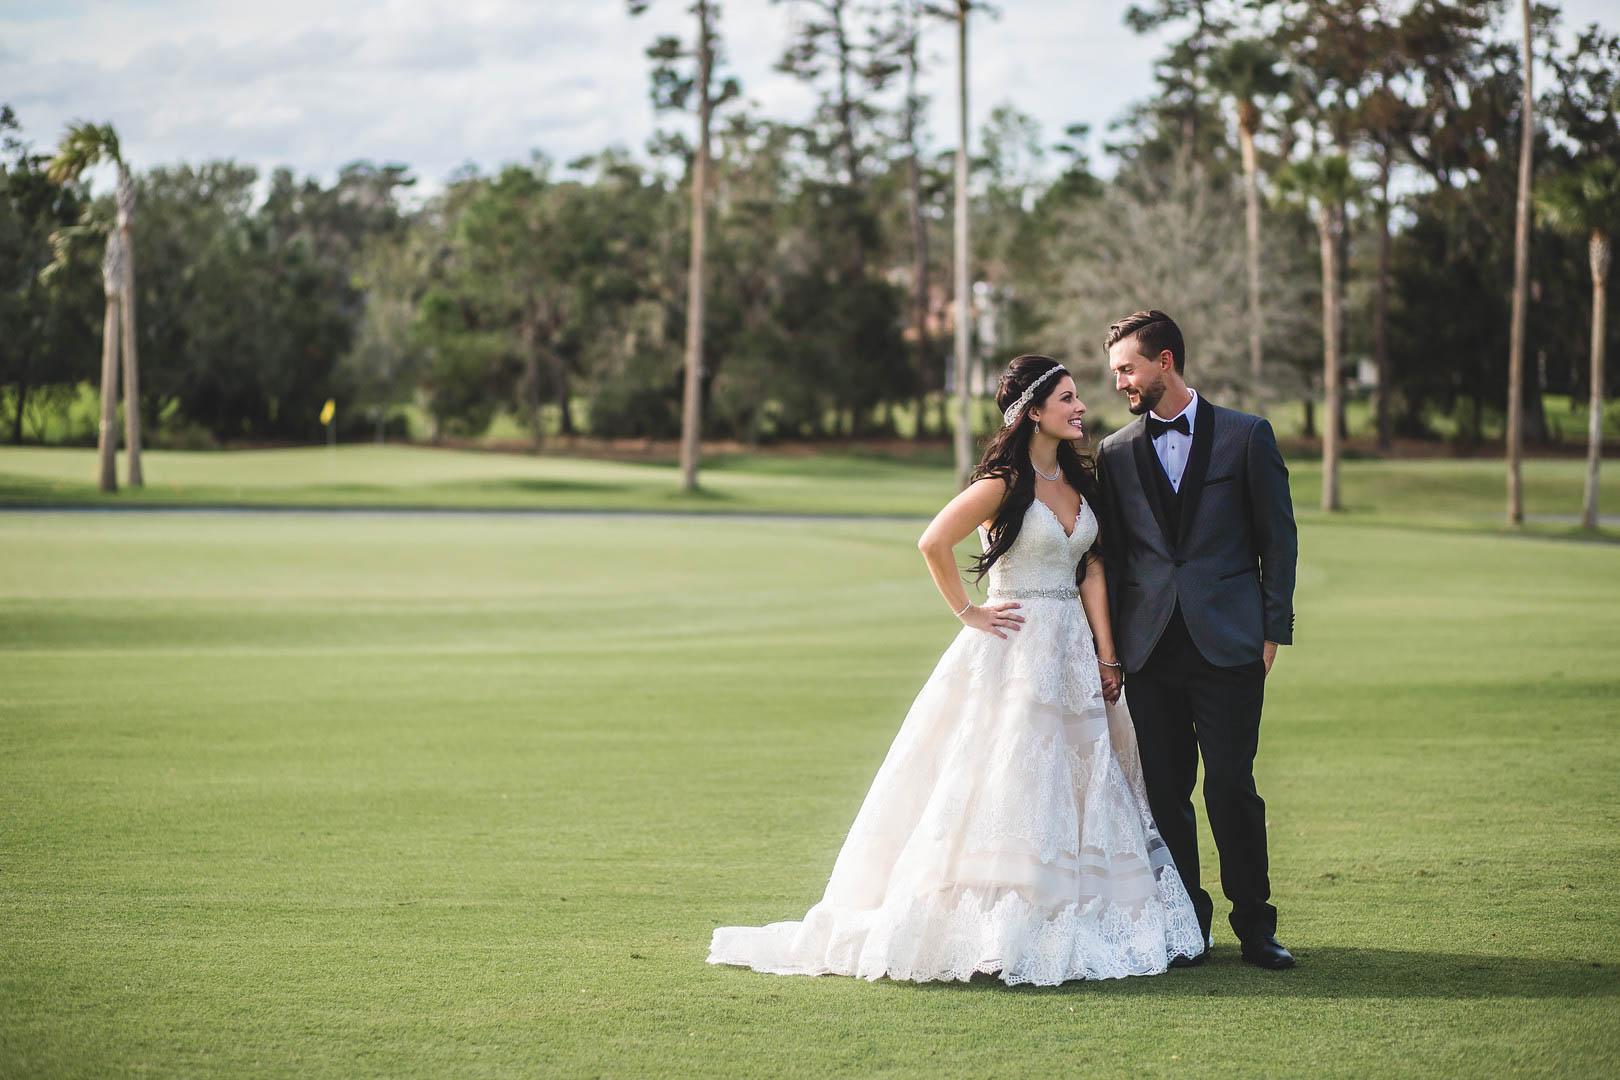 Clubhouse-TPC-Sawgrass-Wedding-Photographer-Adam-Szarmack-59.jpg